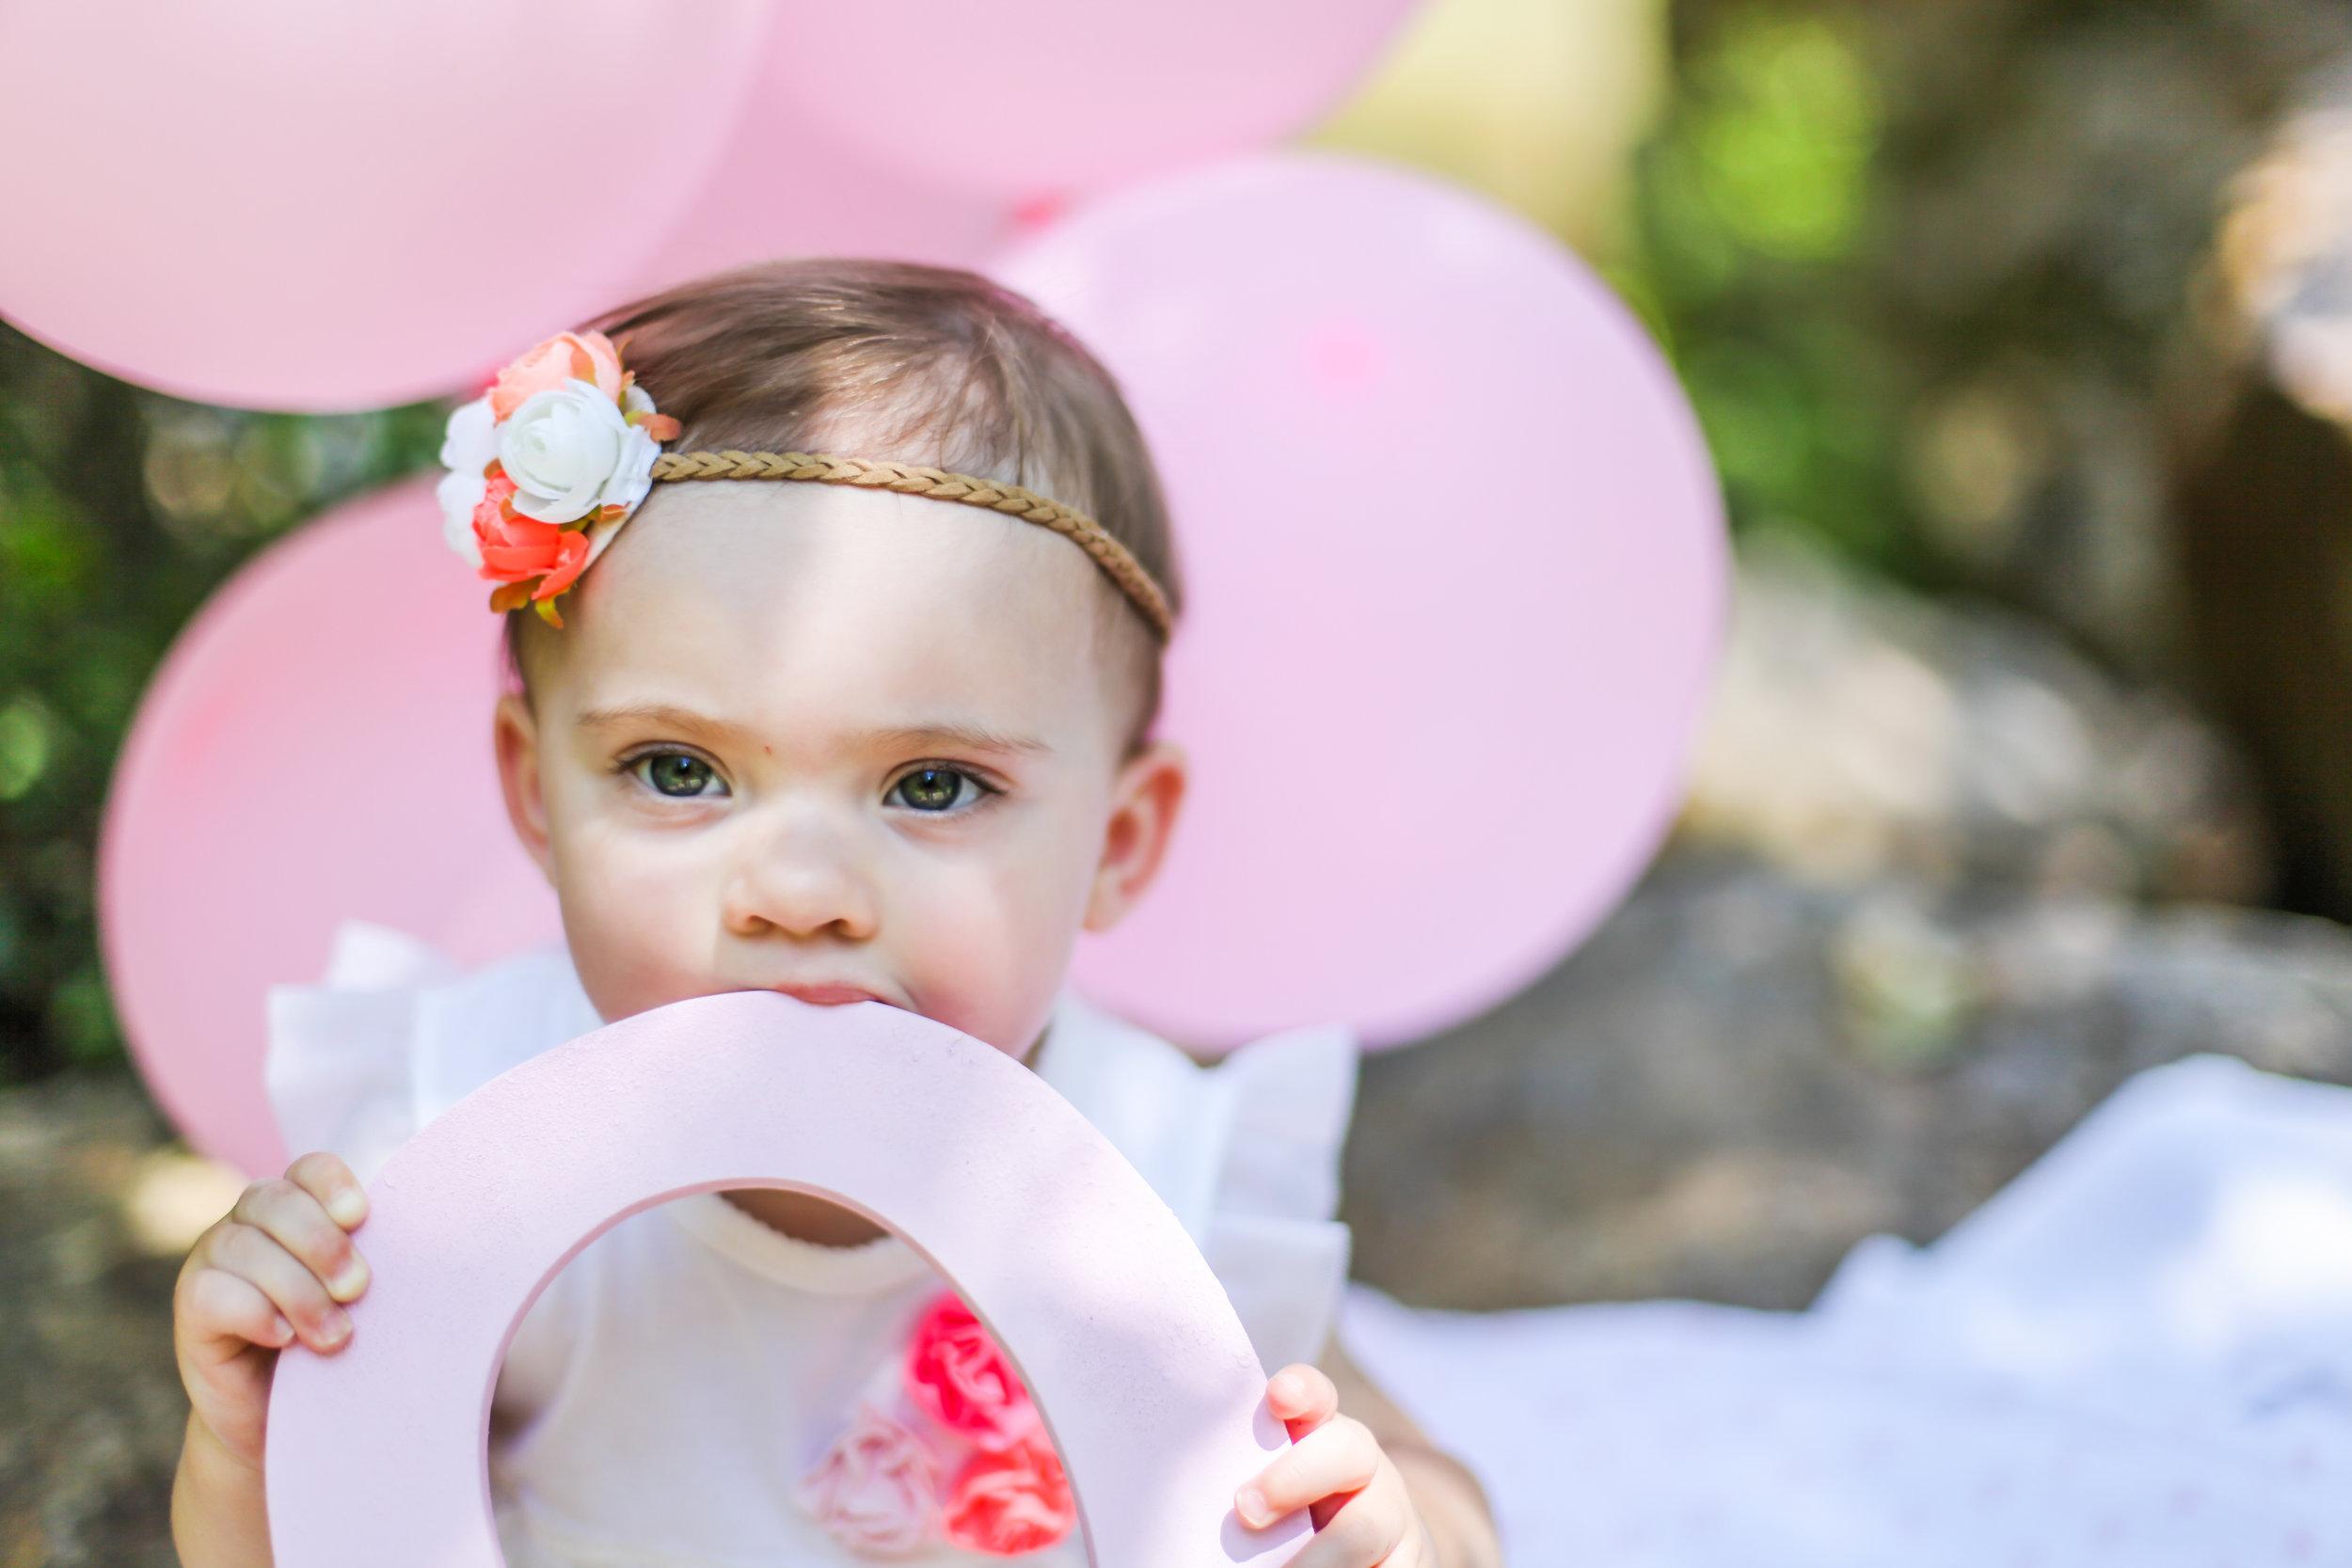 woodstock baby photography angela elliott-85.jpg